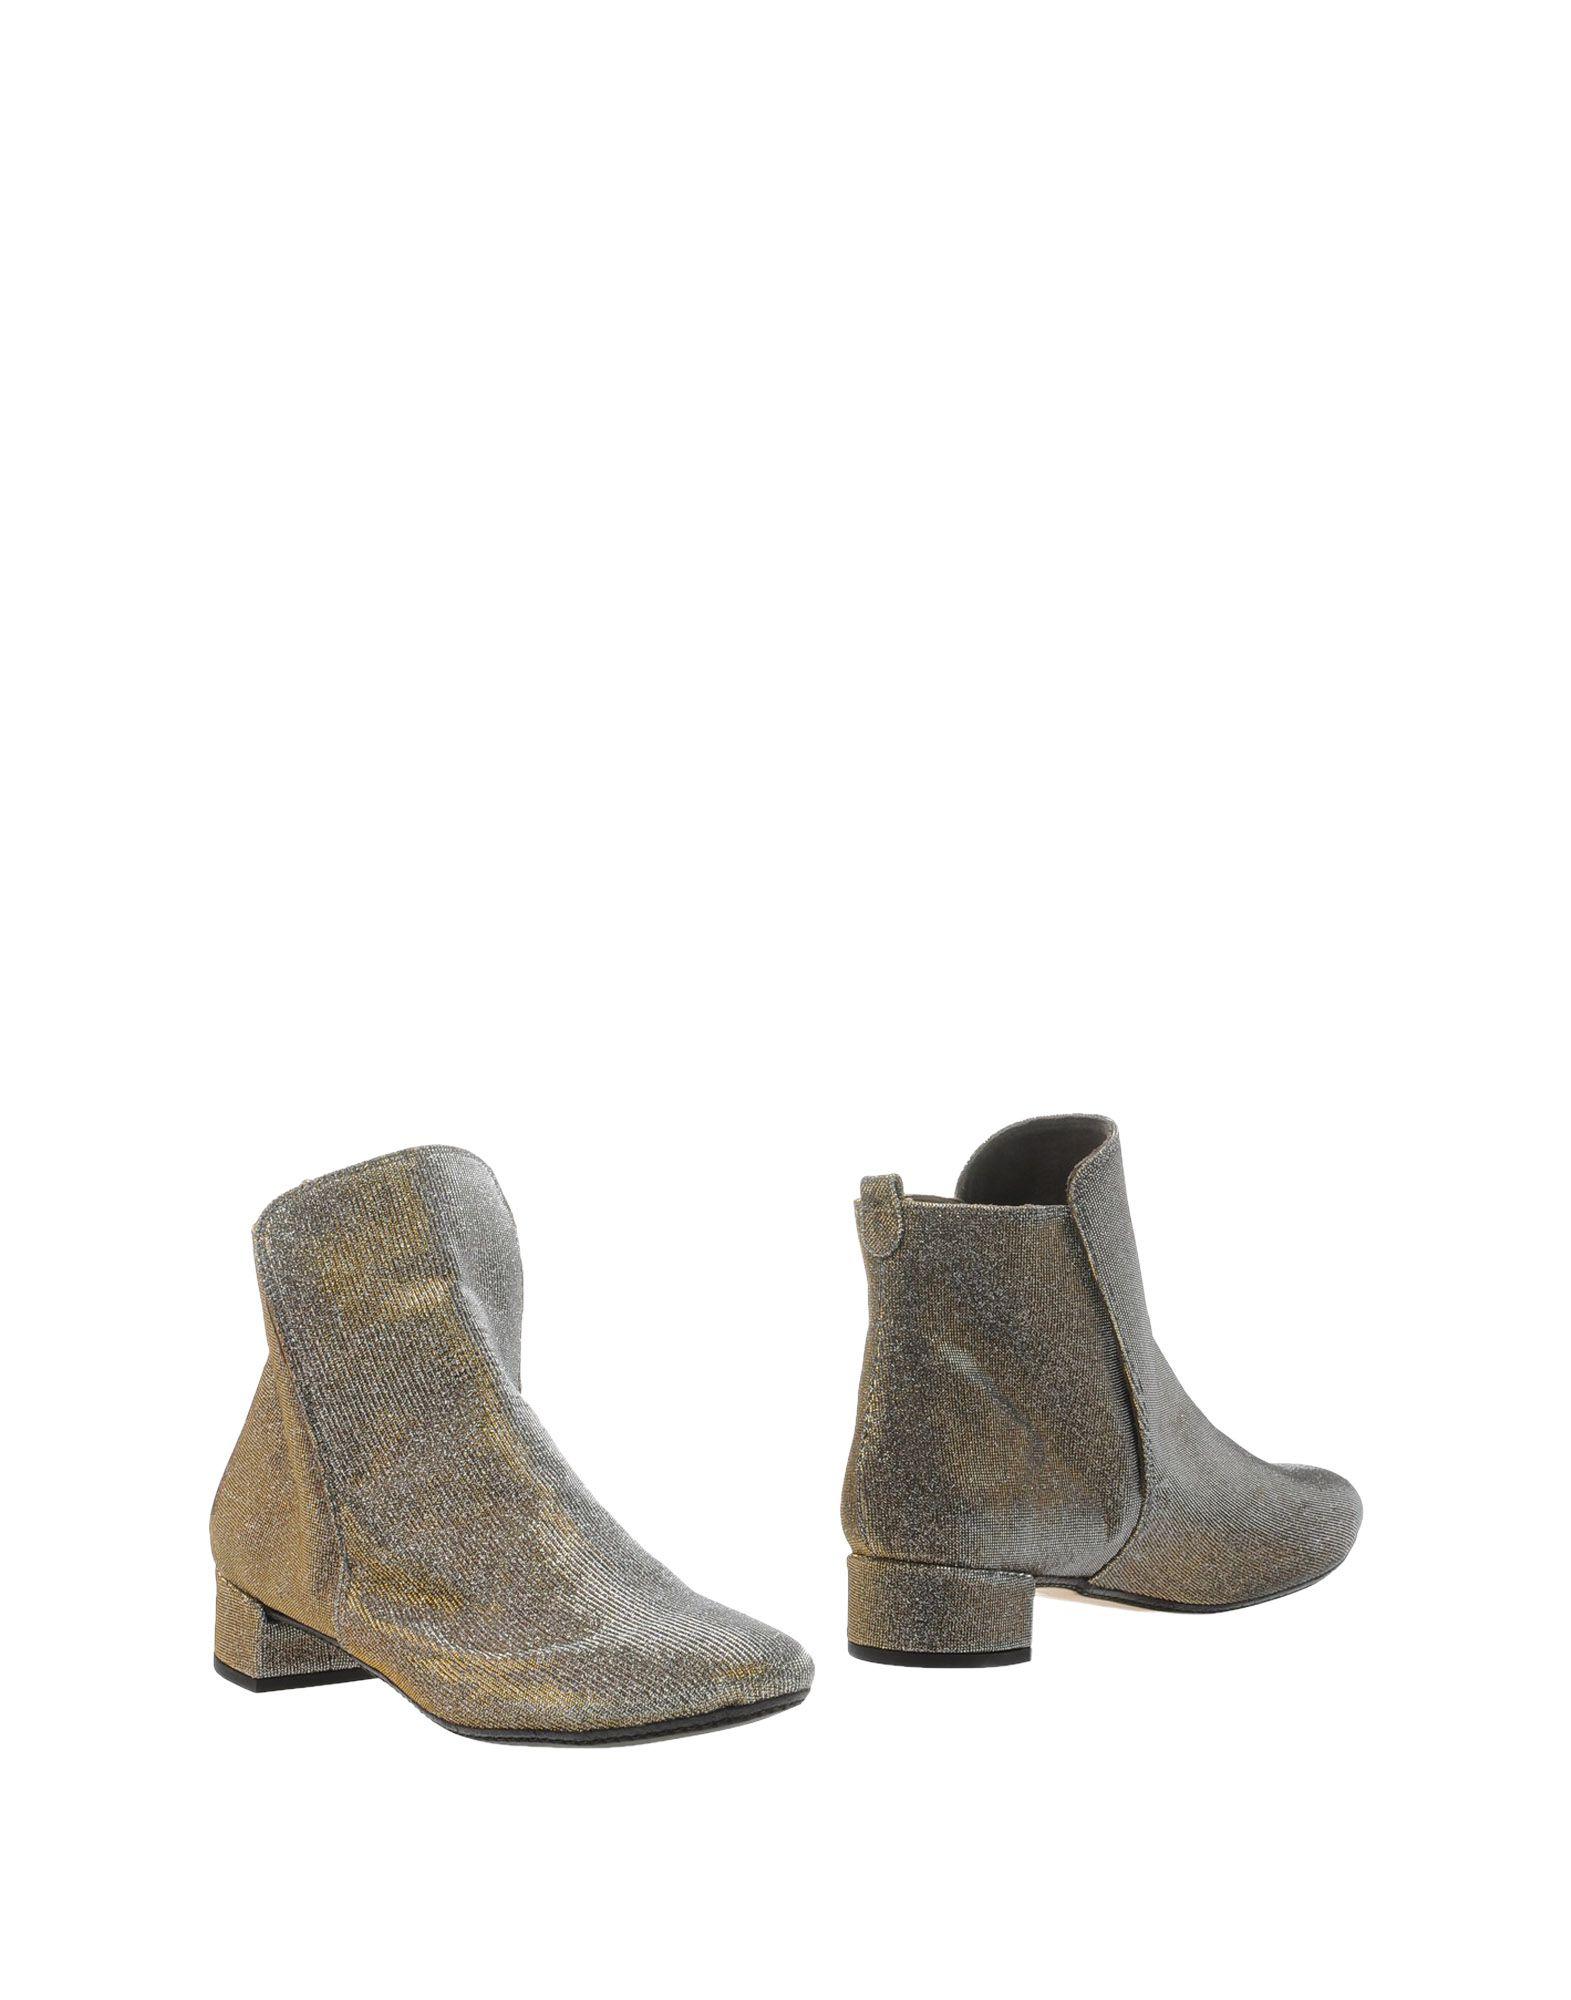 Gut tragenRêve um billige Schuhe zu tragenRêve Gut D'un Jour Stiefelette Damen  44889984JX a98079